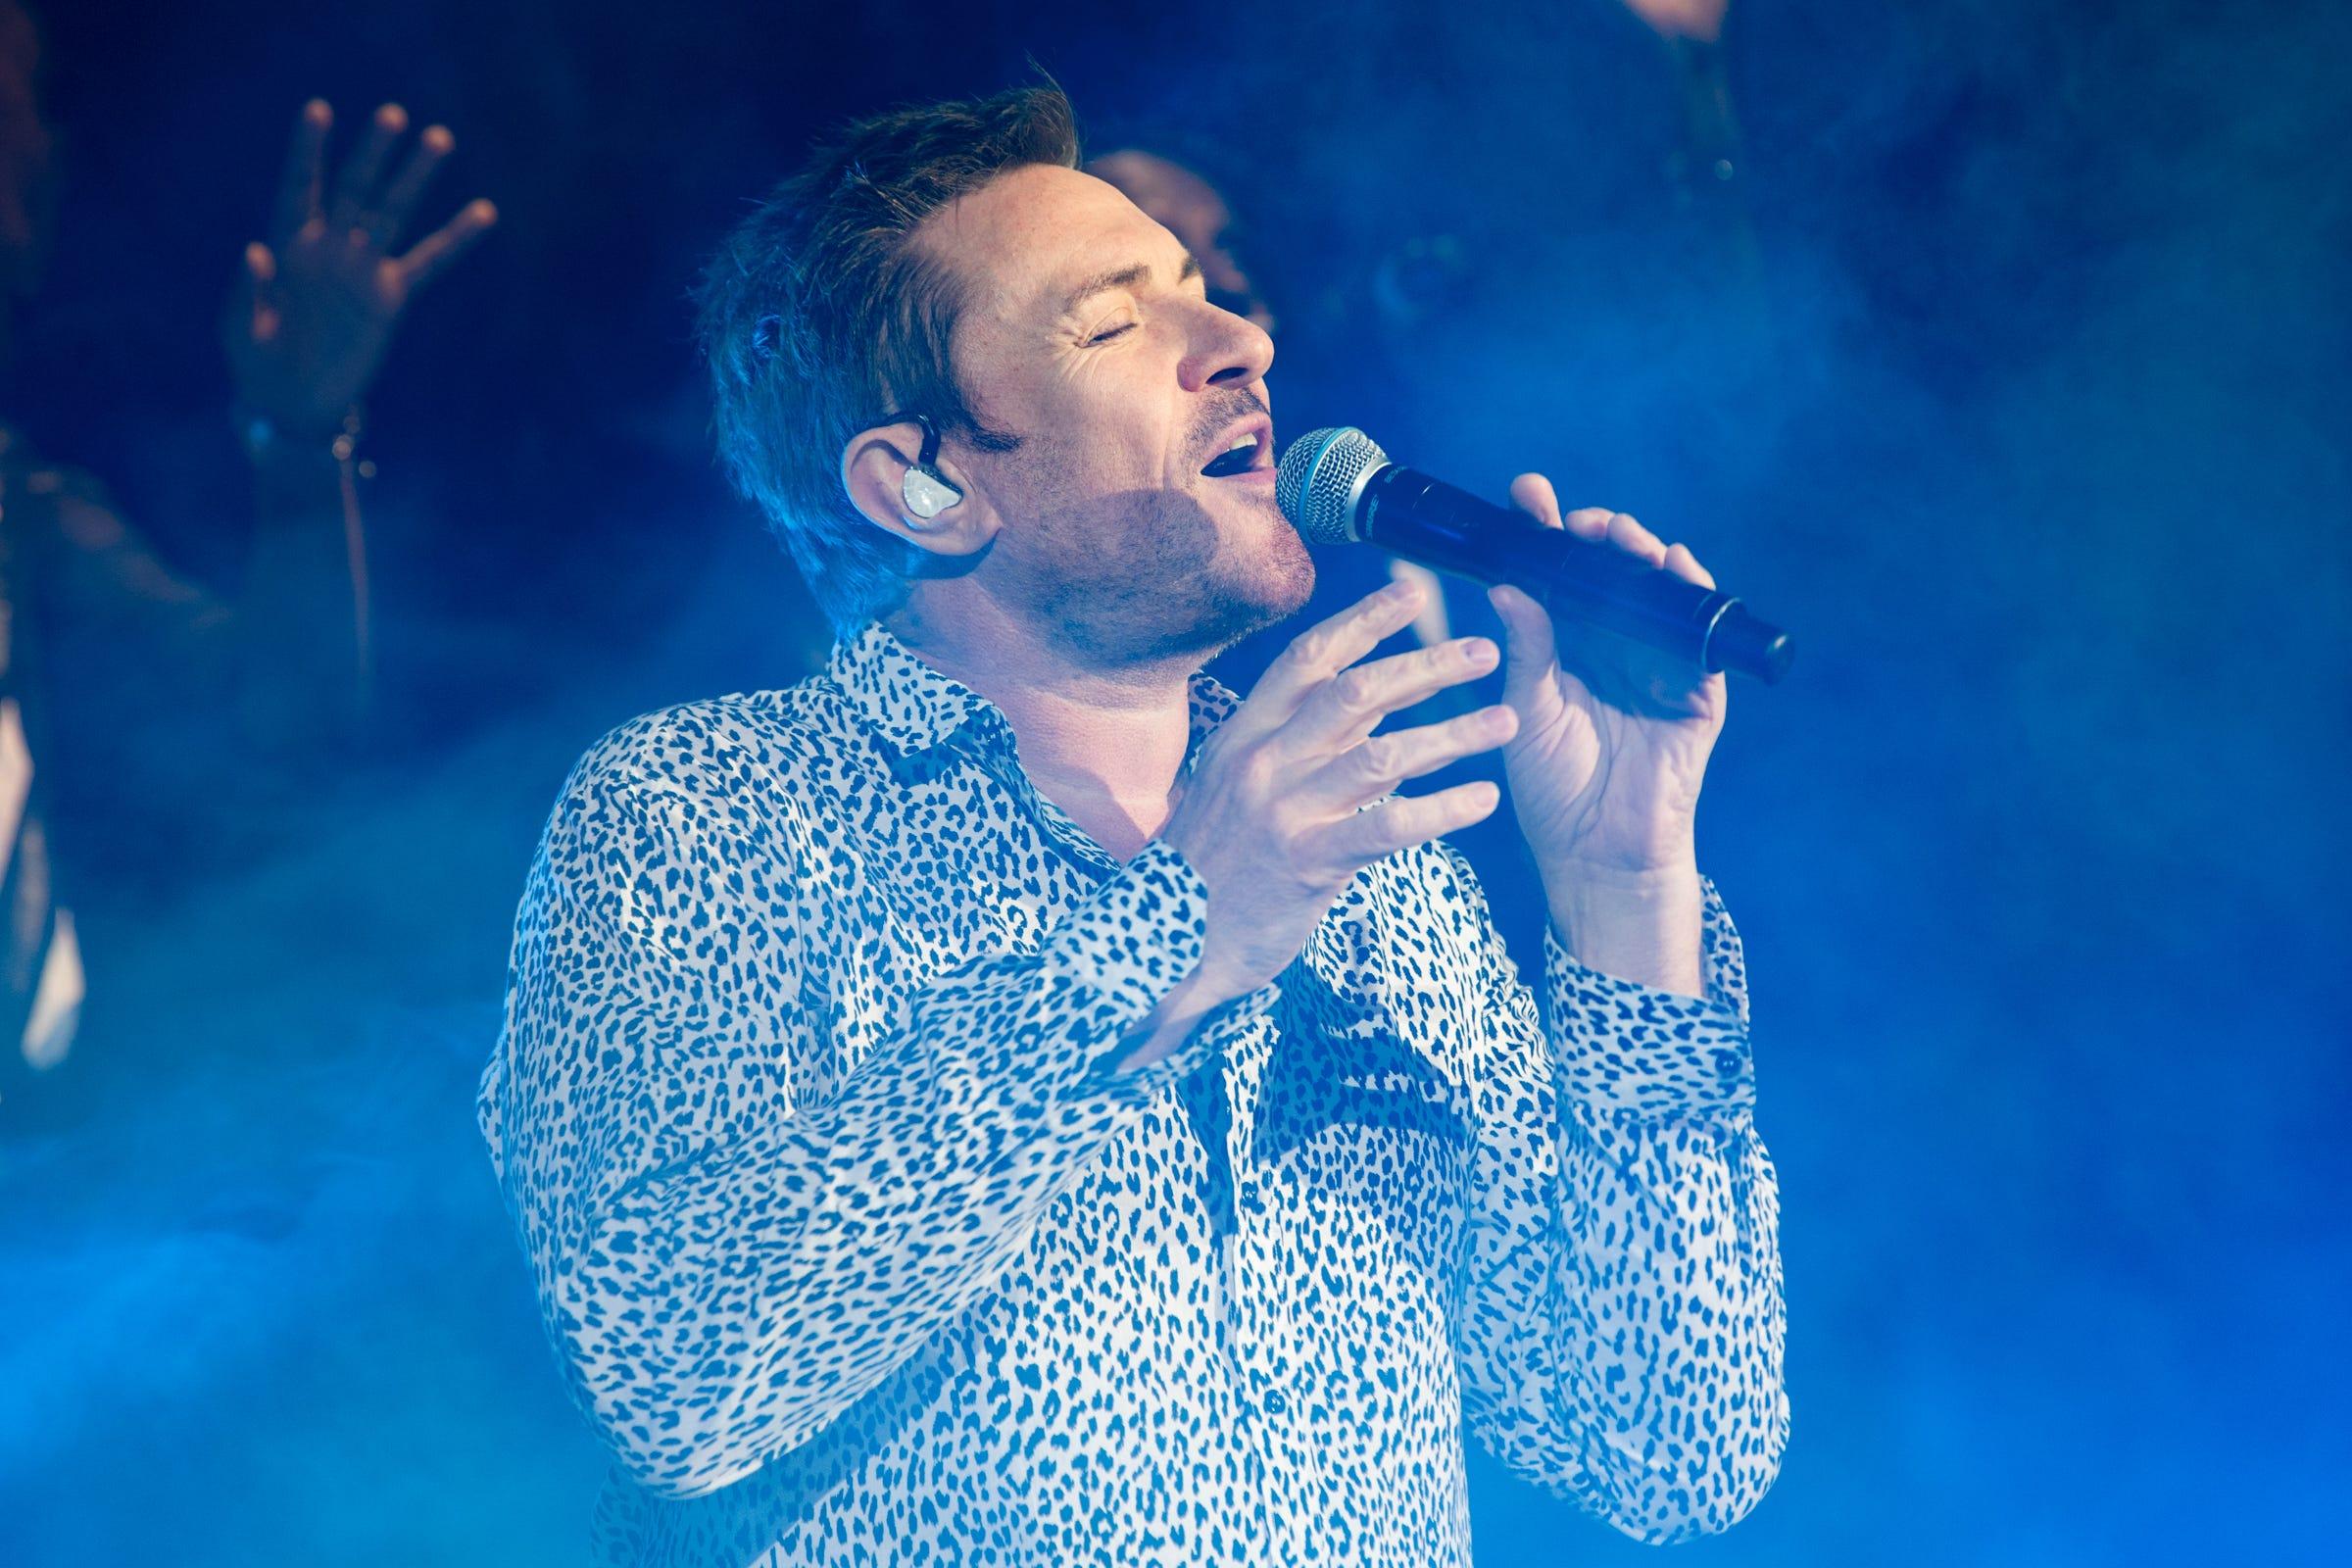 Duran Duran will replace Stevie Nicks as ACL Fest headliner